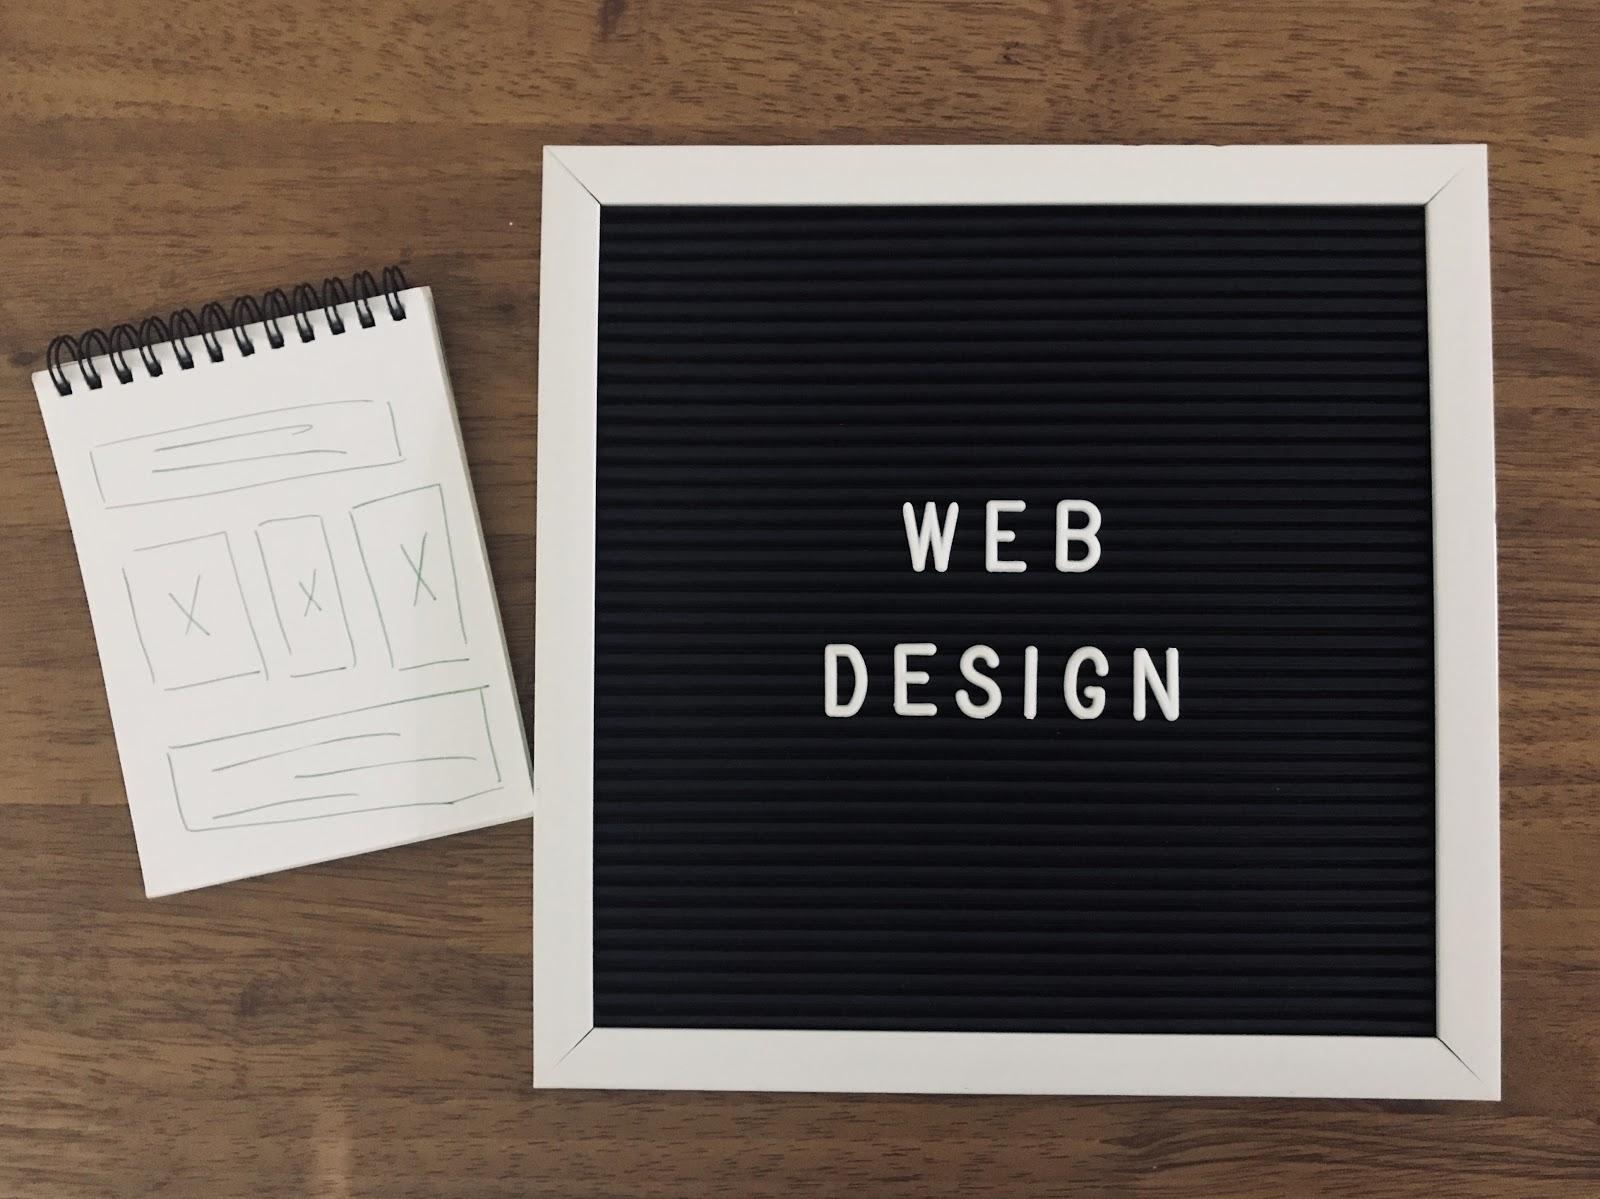 Web Design Trends for 2021